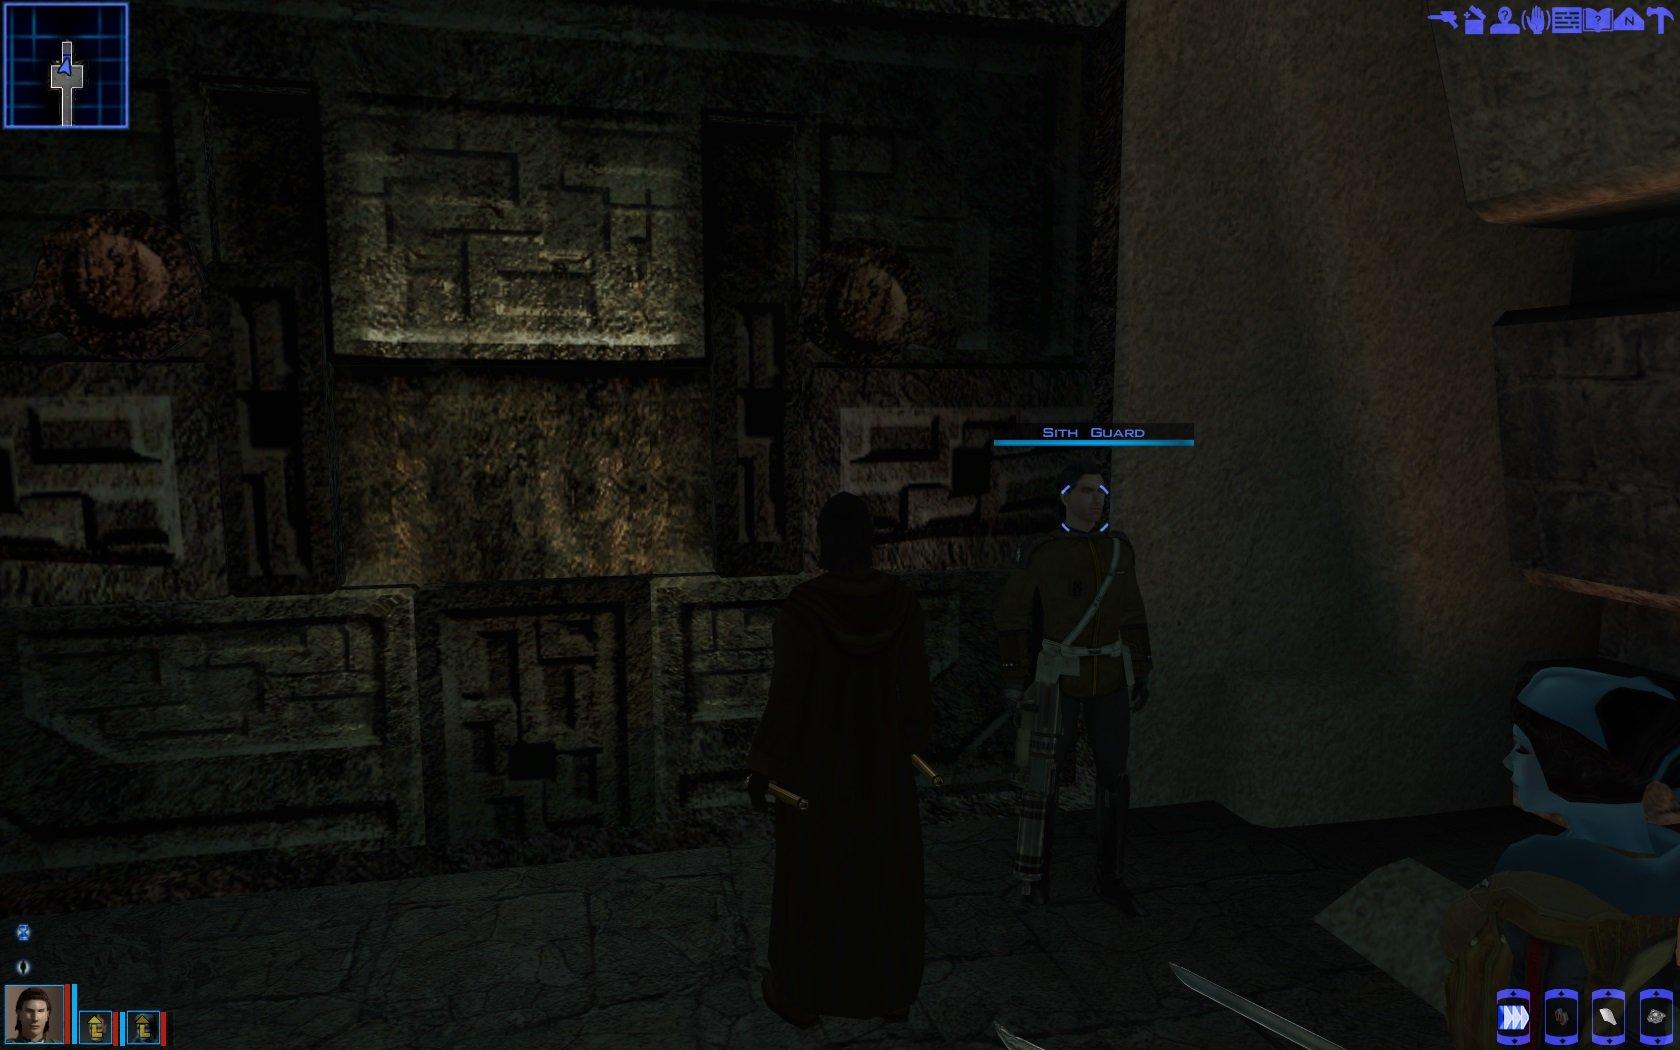 Korriban-Sith-Guard-at-the-academy4.jpg